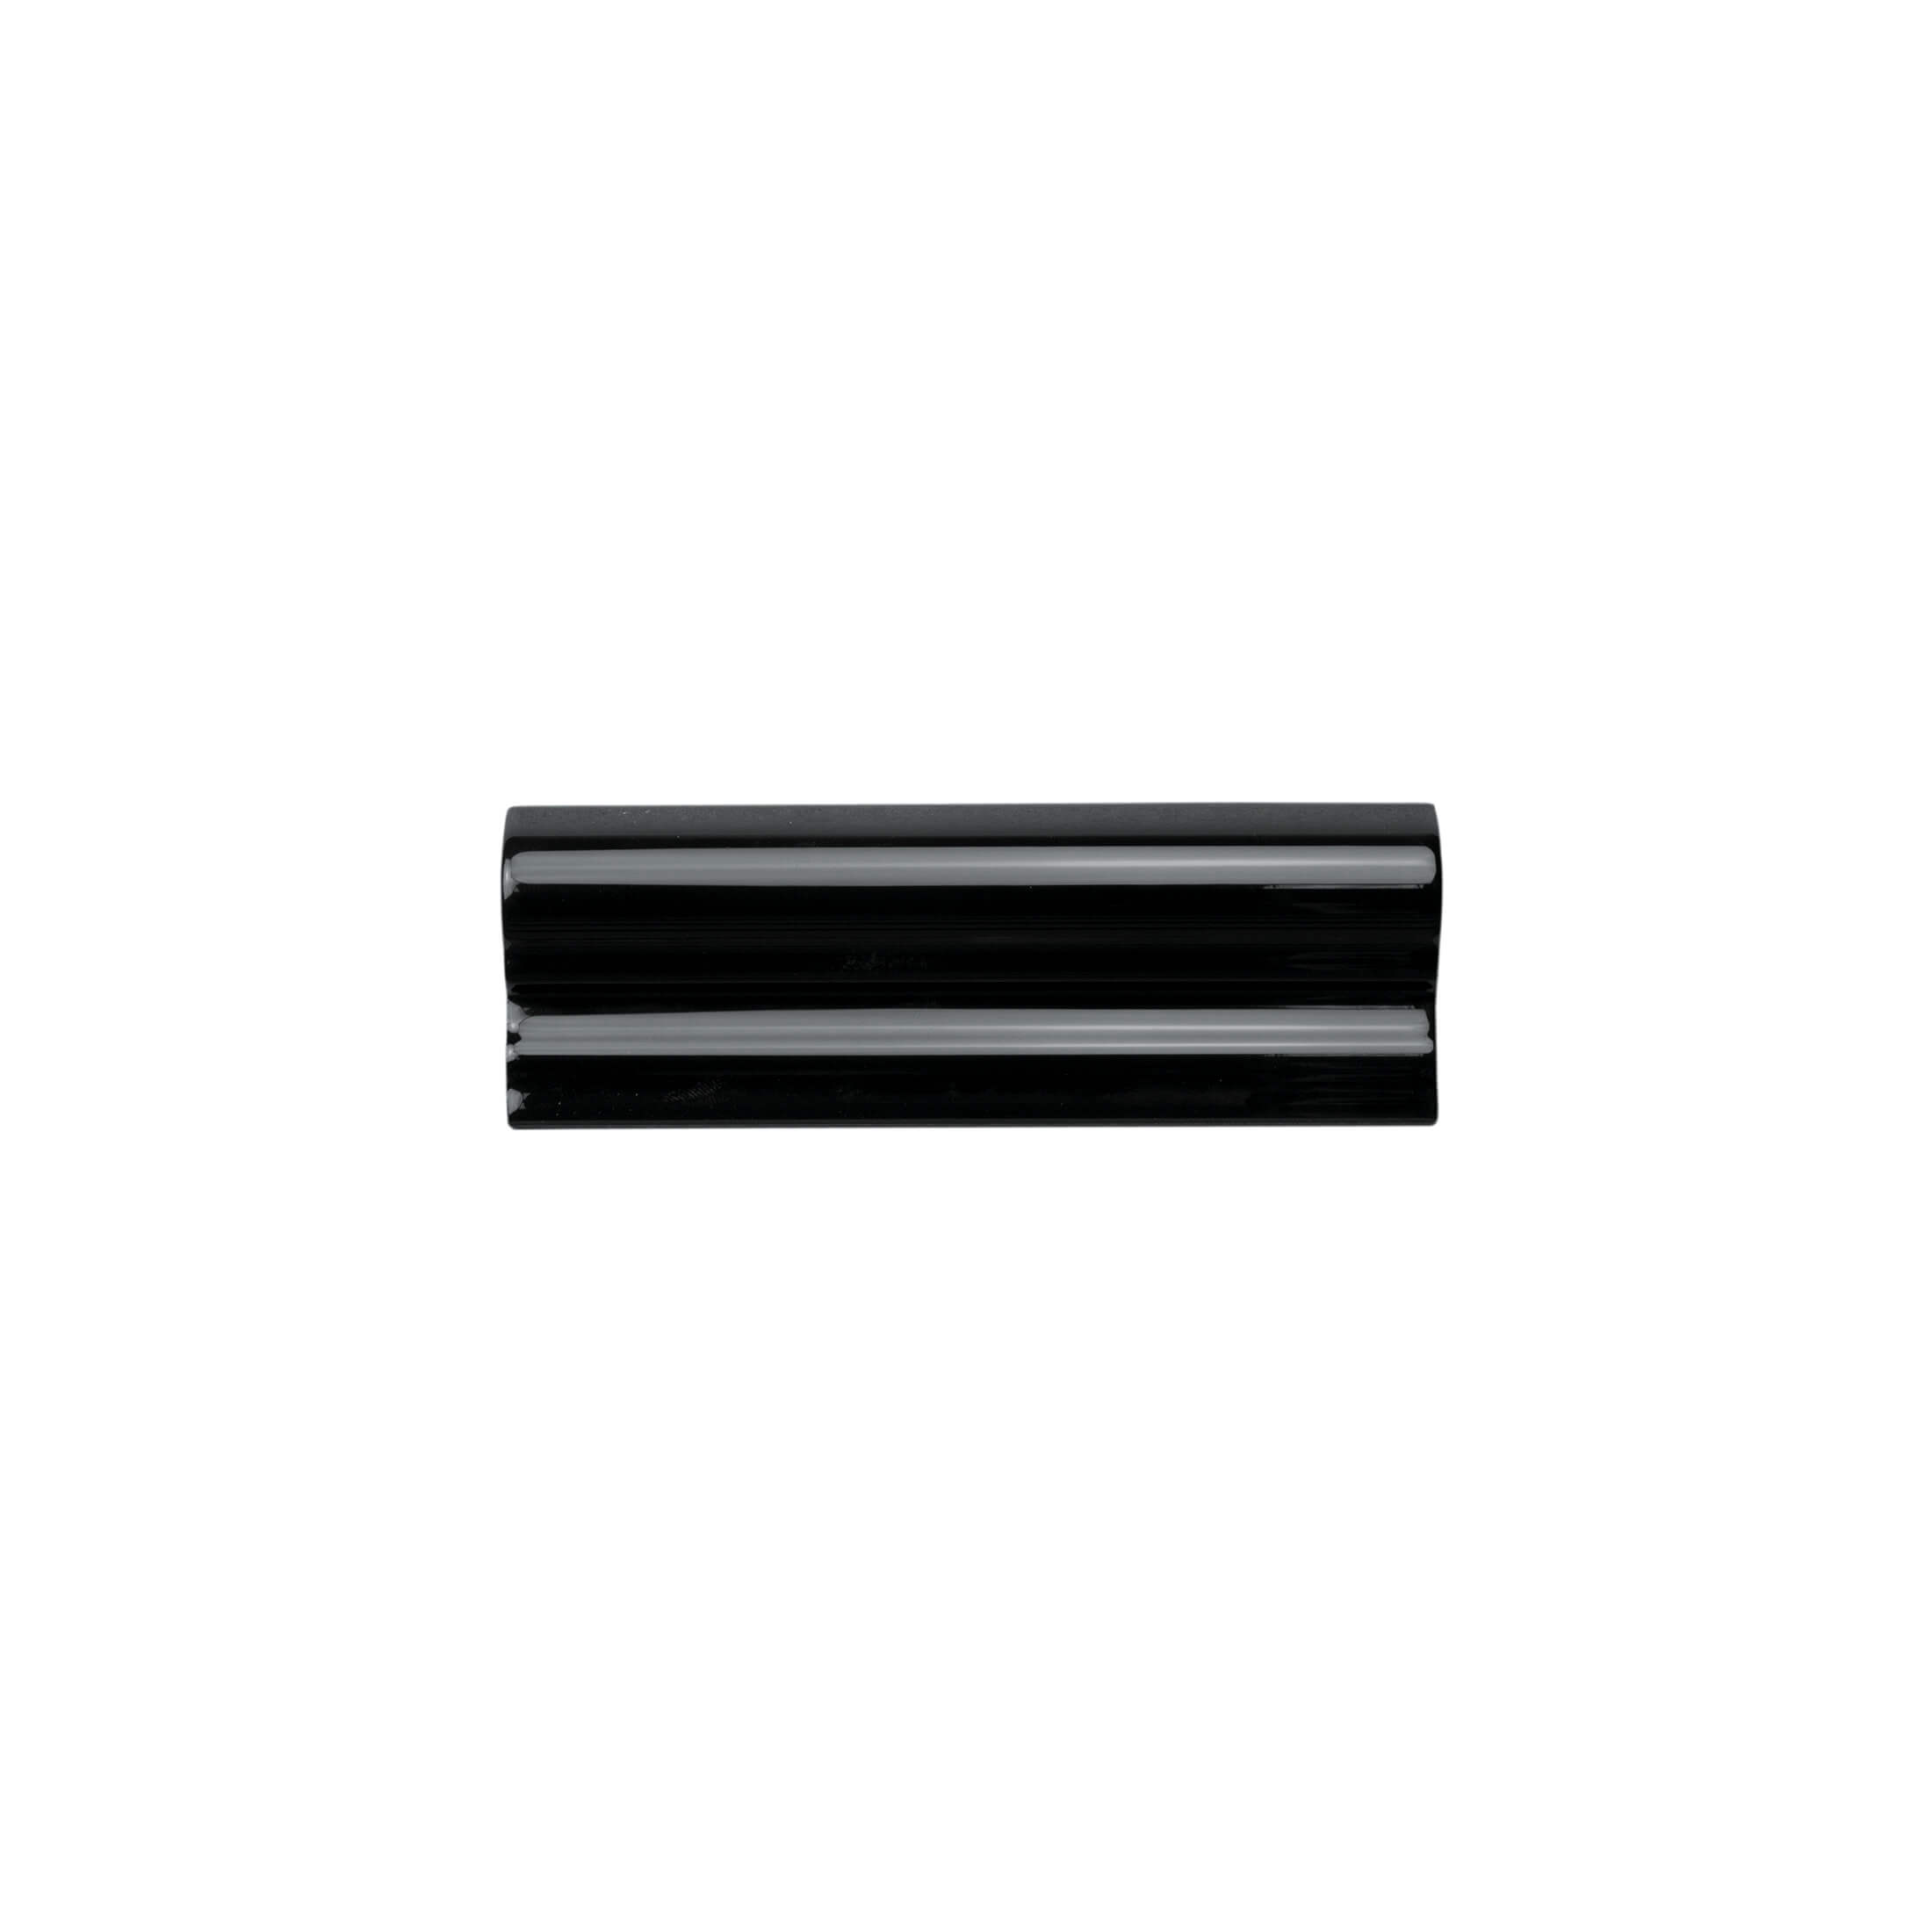 ADNE5318 - MOLDURA ITALIANA PB - 5 cm X 15 cm